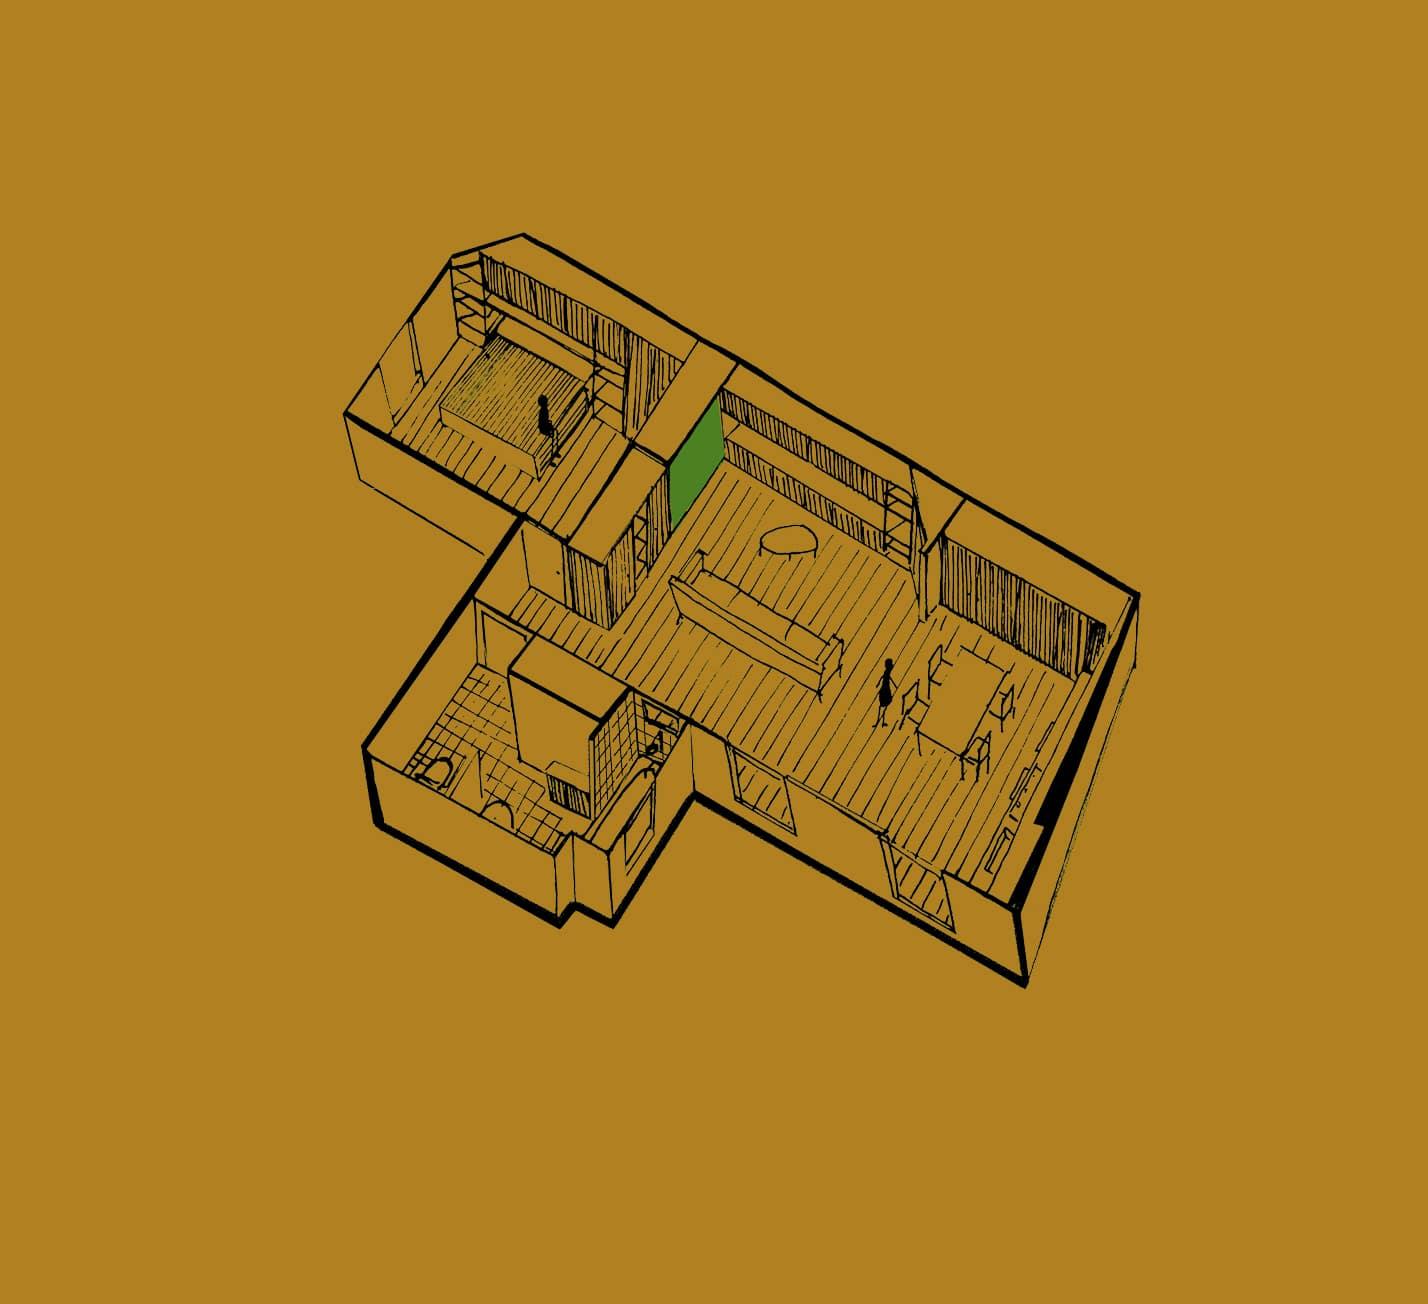 Projet-Cavallotti-Atelier-Steve-Pauline-Borgia-Architecte-Axo-10-min